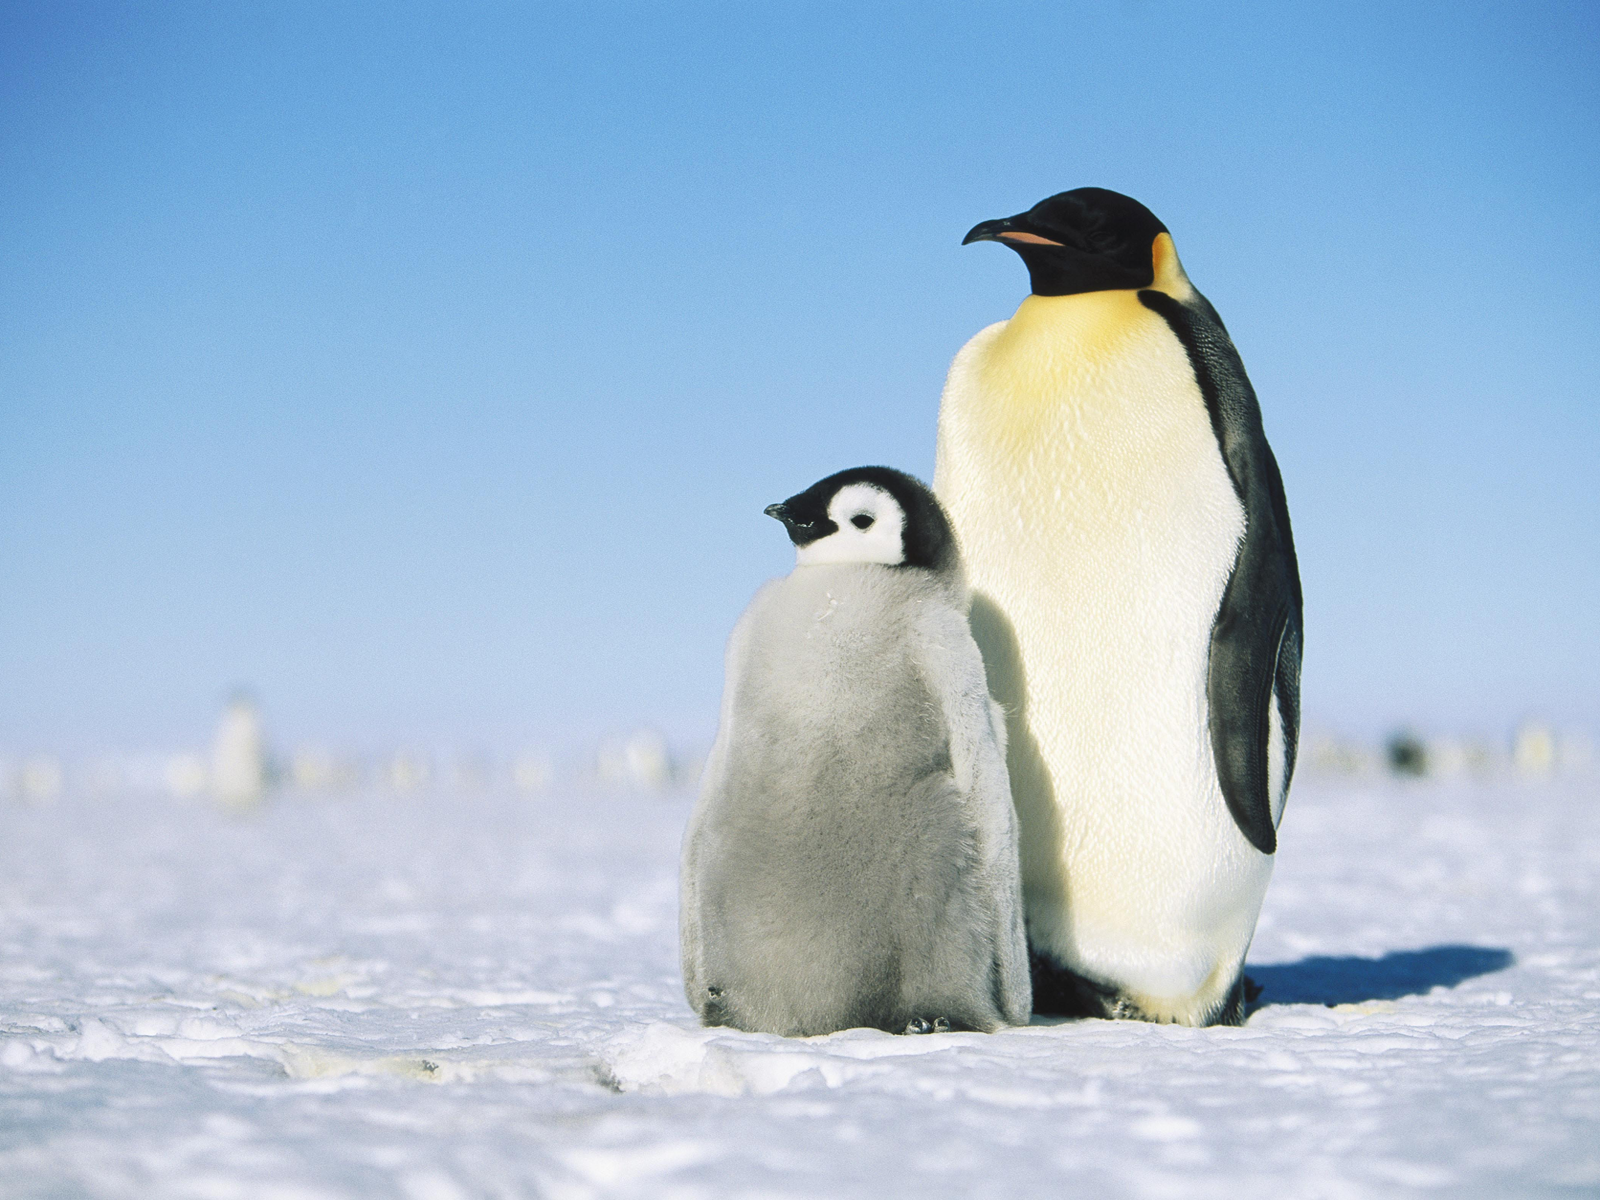 Penguin HD PNG - 92446